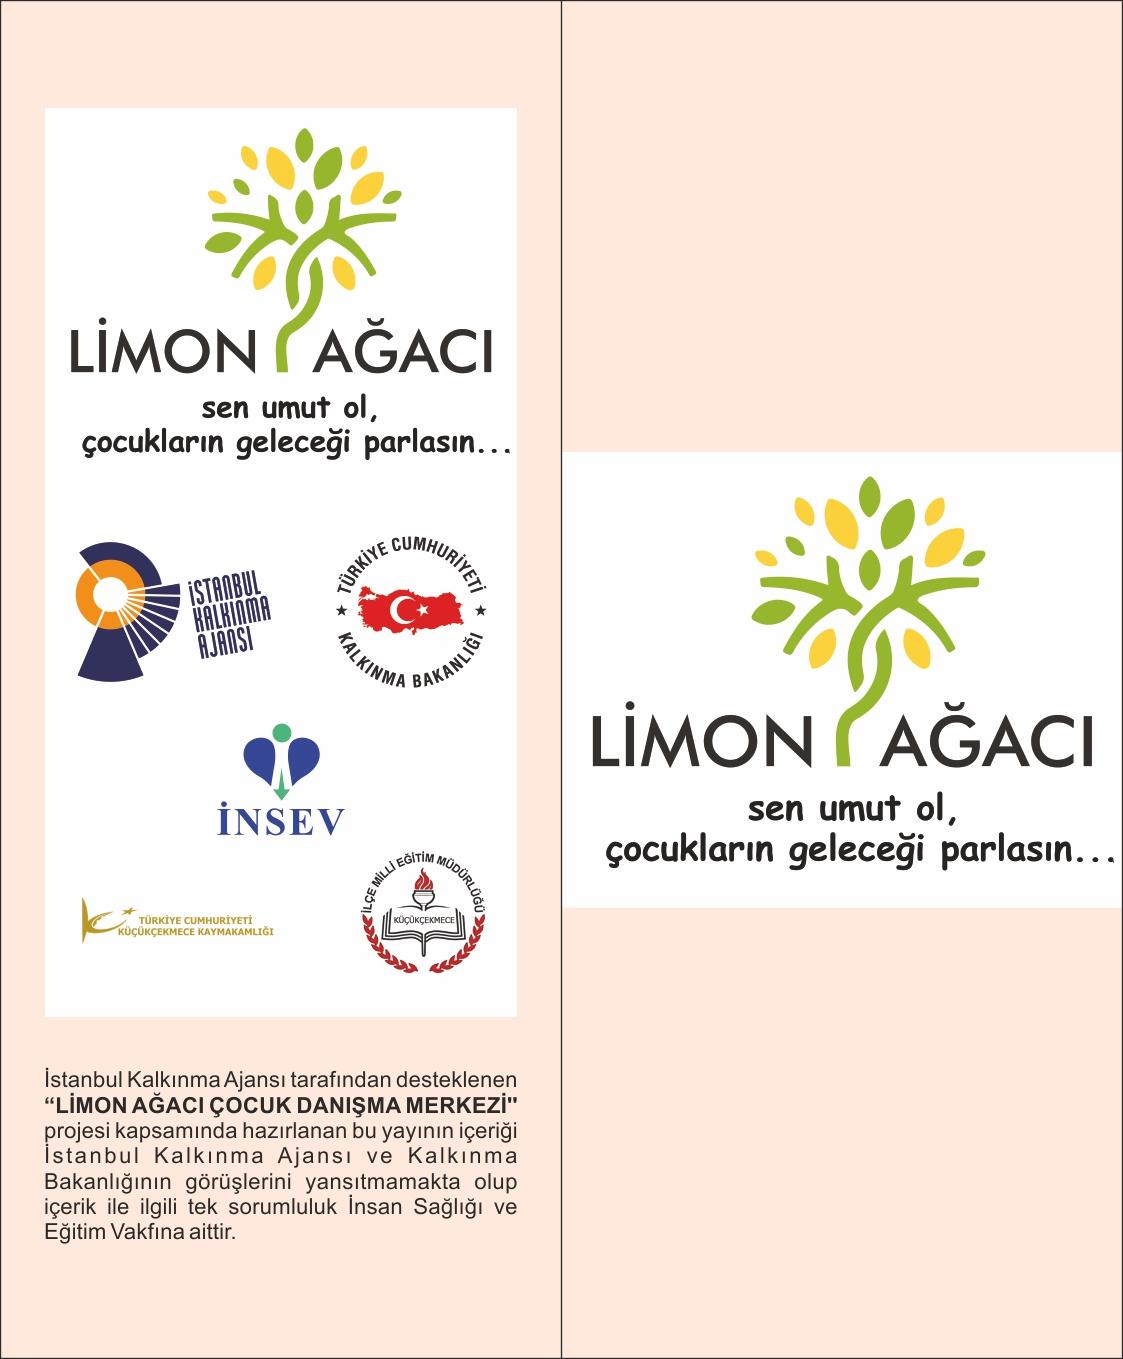 limon-agaci_brosur-dis